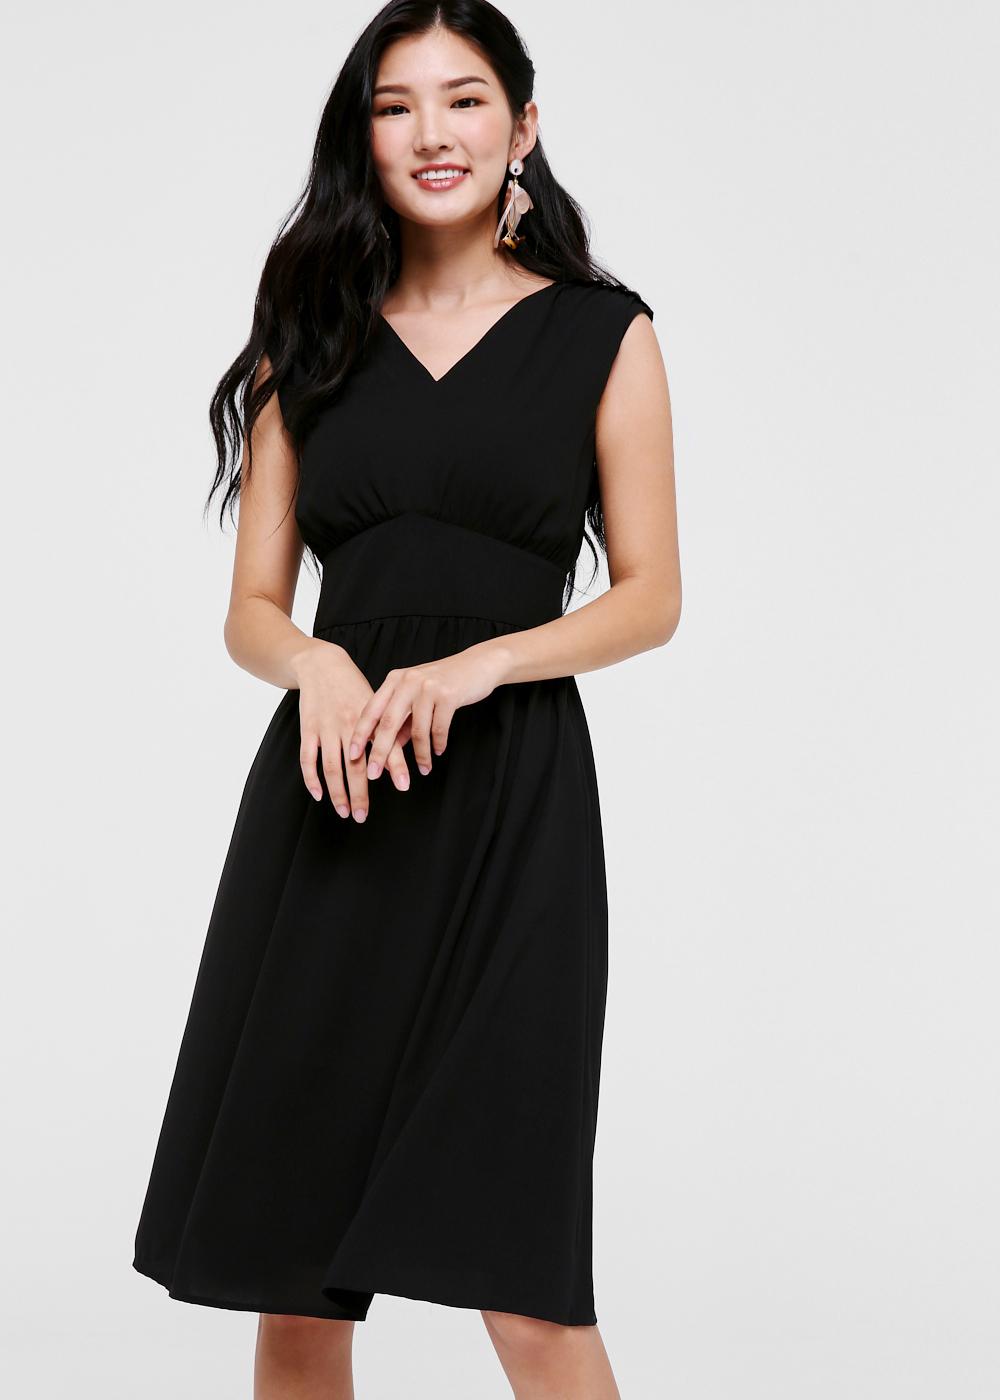 Lex Empire Waist Midi Dress